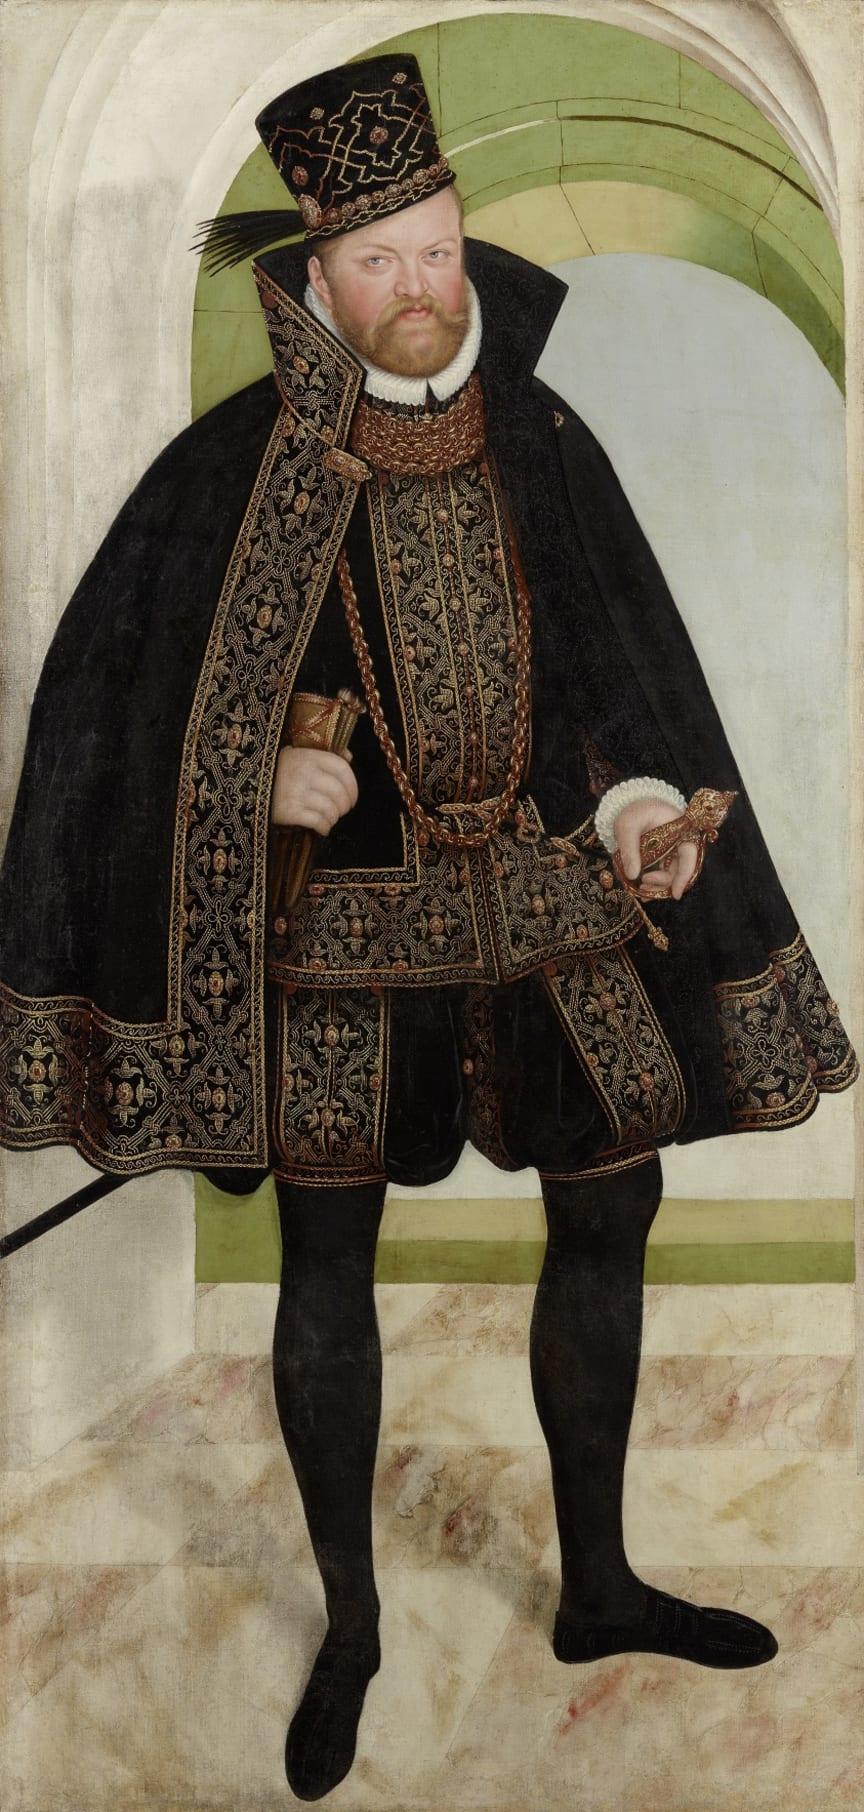 Kurfürst August von Lucas Cranach d. J._1565 (c) KHM-Museumsverband.jpg